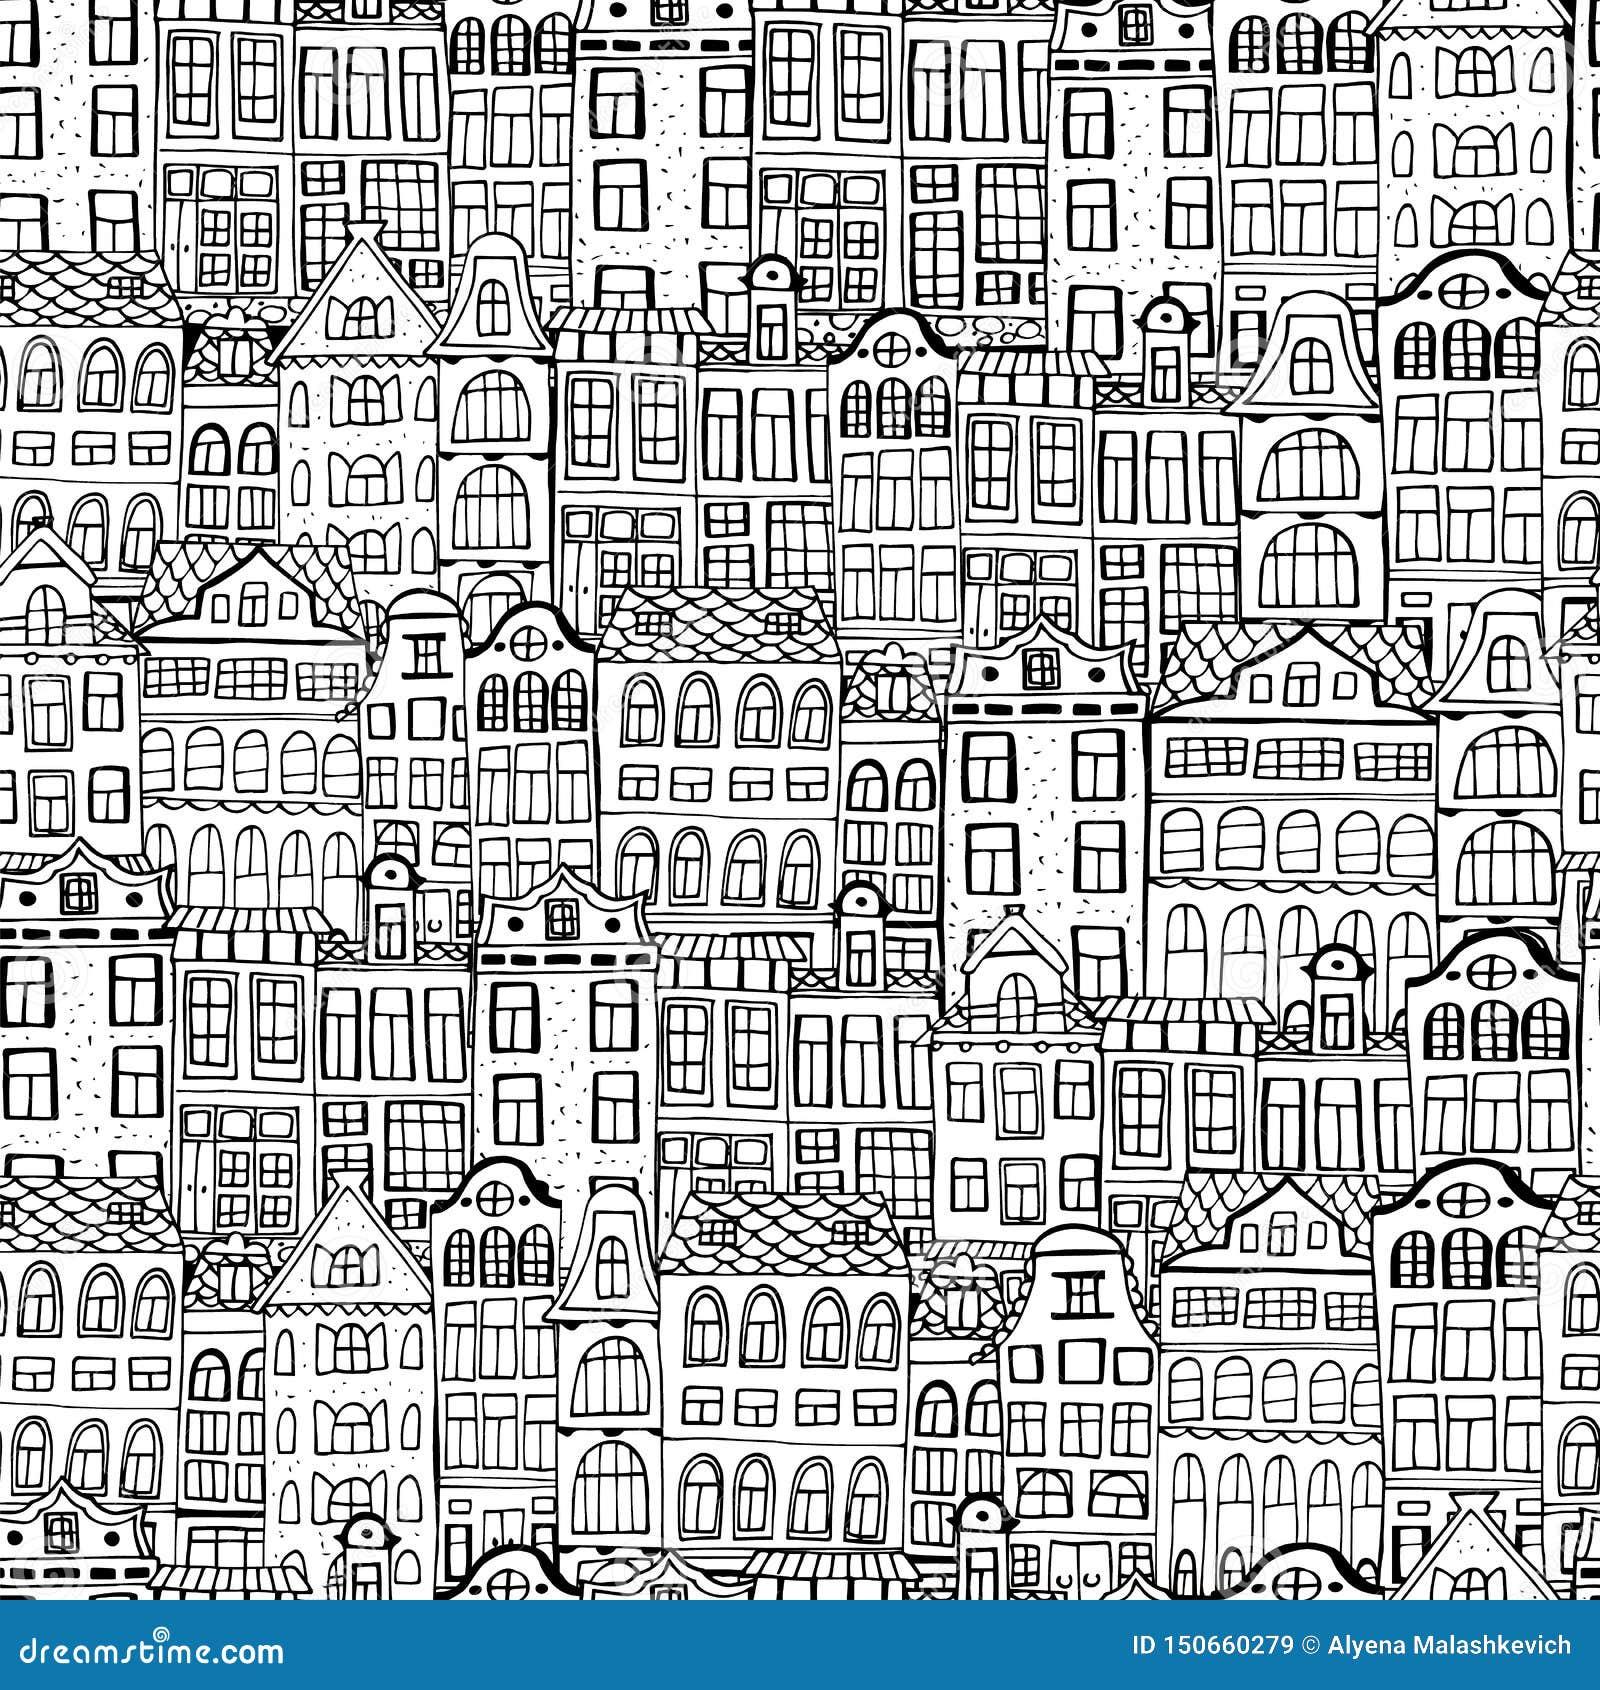 Flat cartoon historic buildings city town Amsterdam panorama Holland. Vector illustration